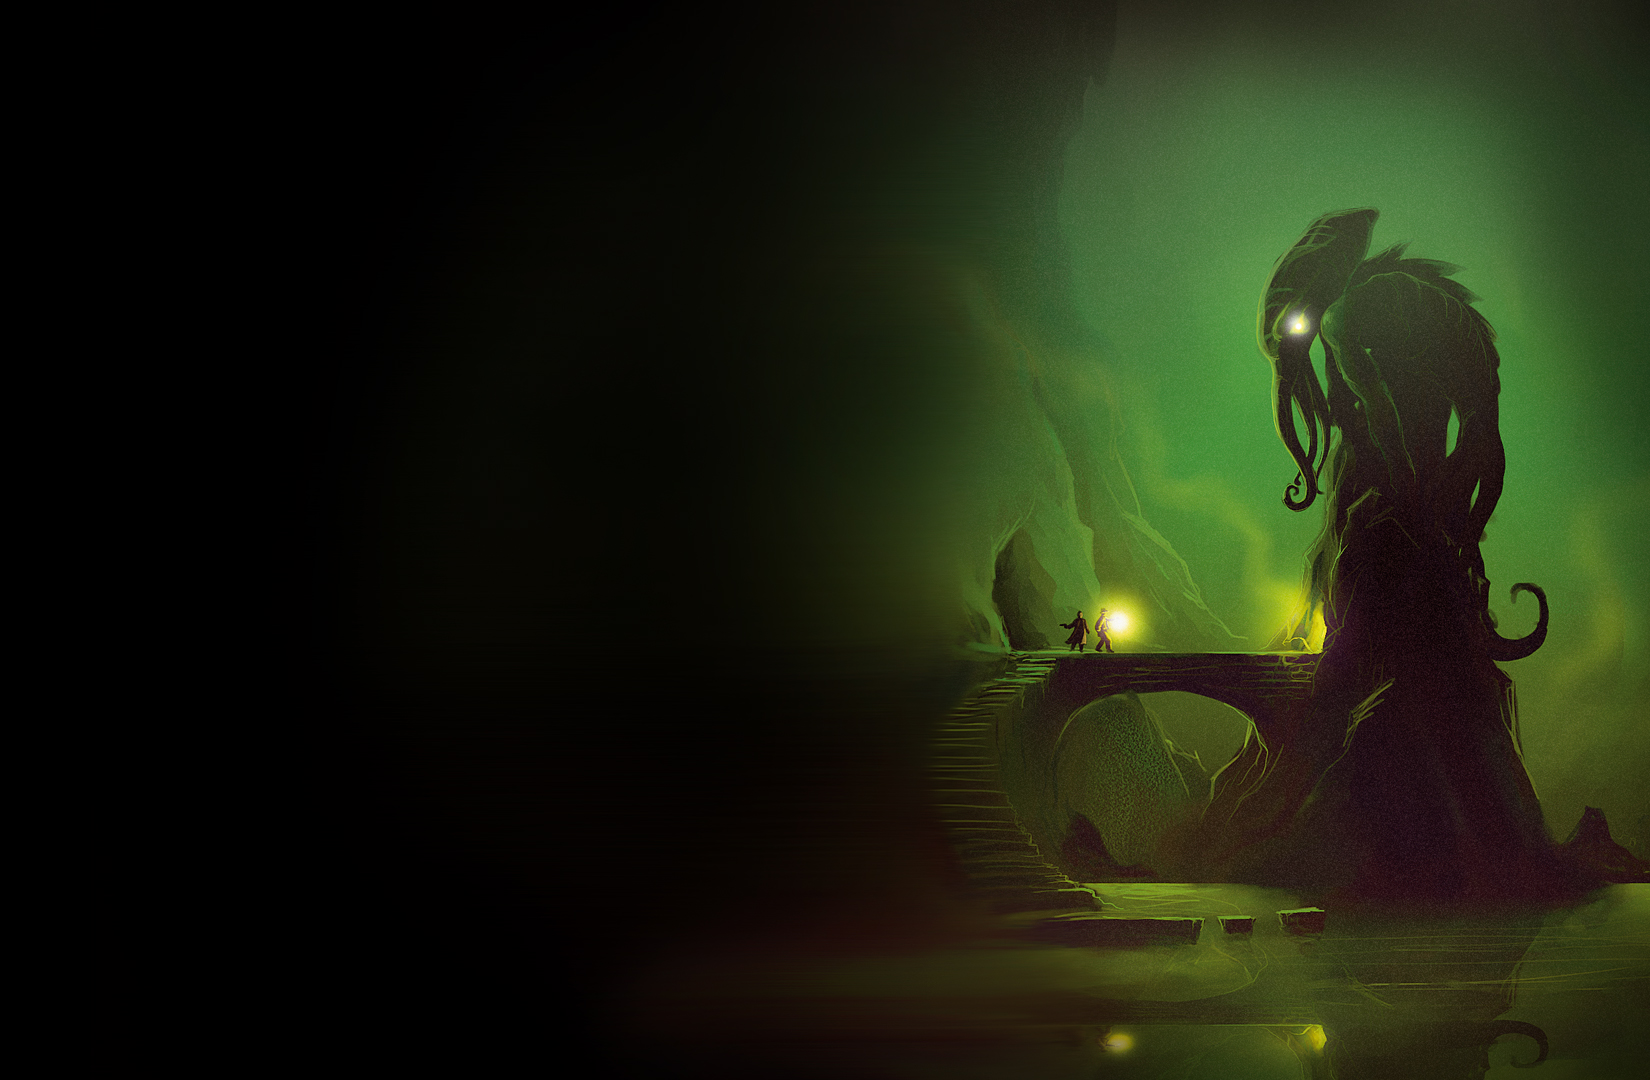 Hp Lovecraft Art Wallpapers: Cthulhu's Comic Corner